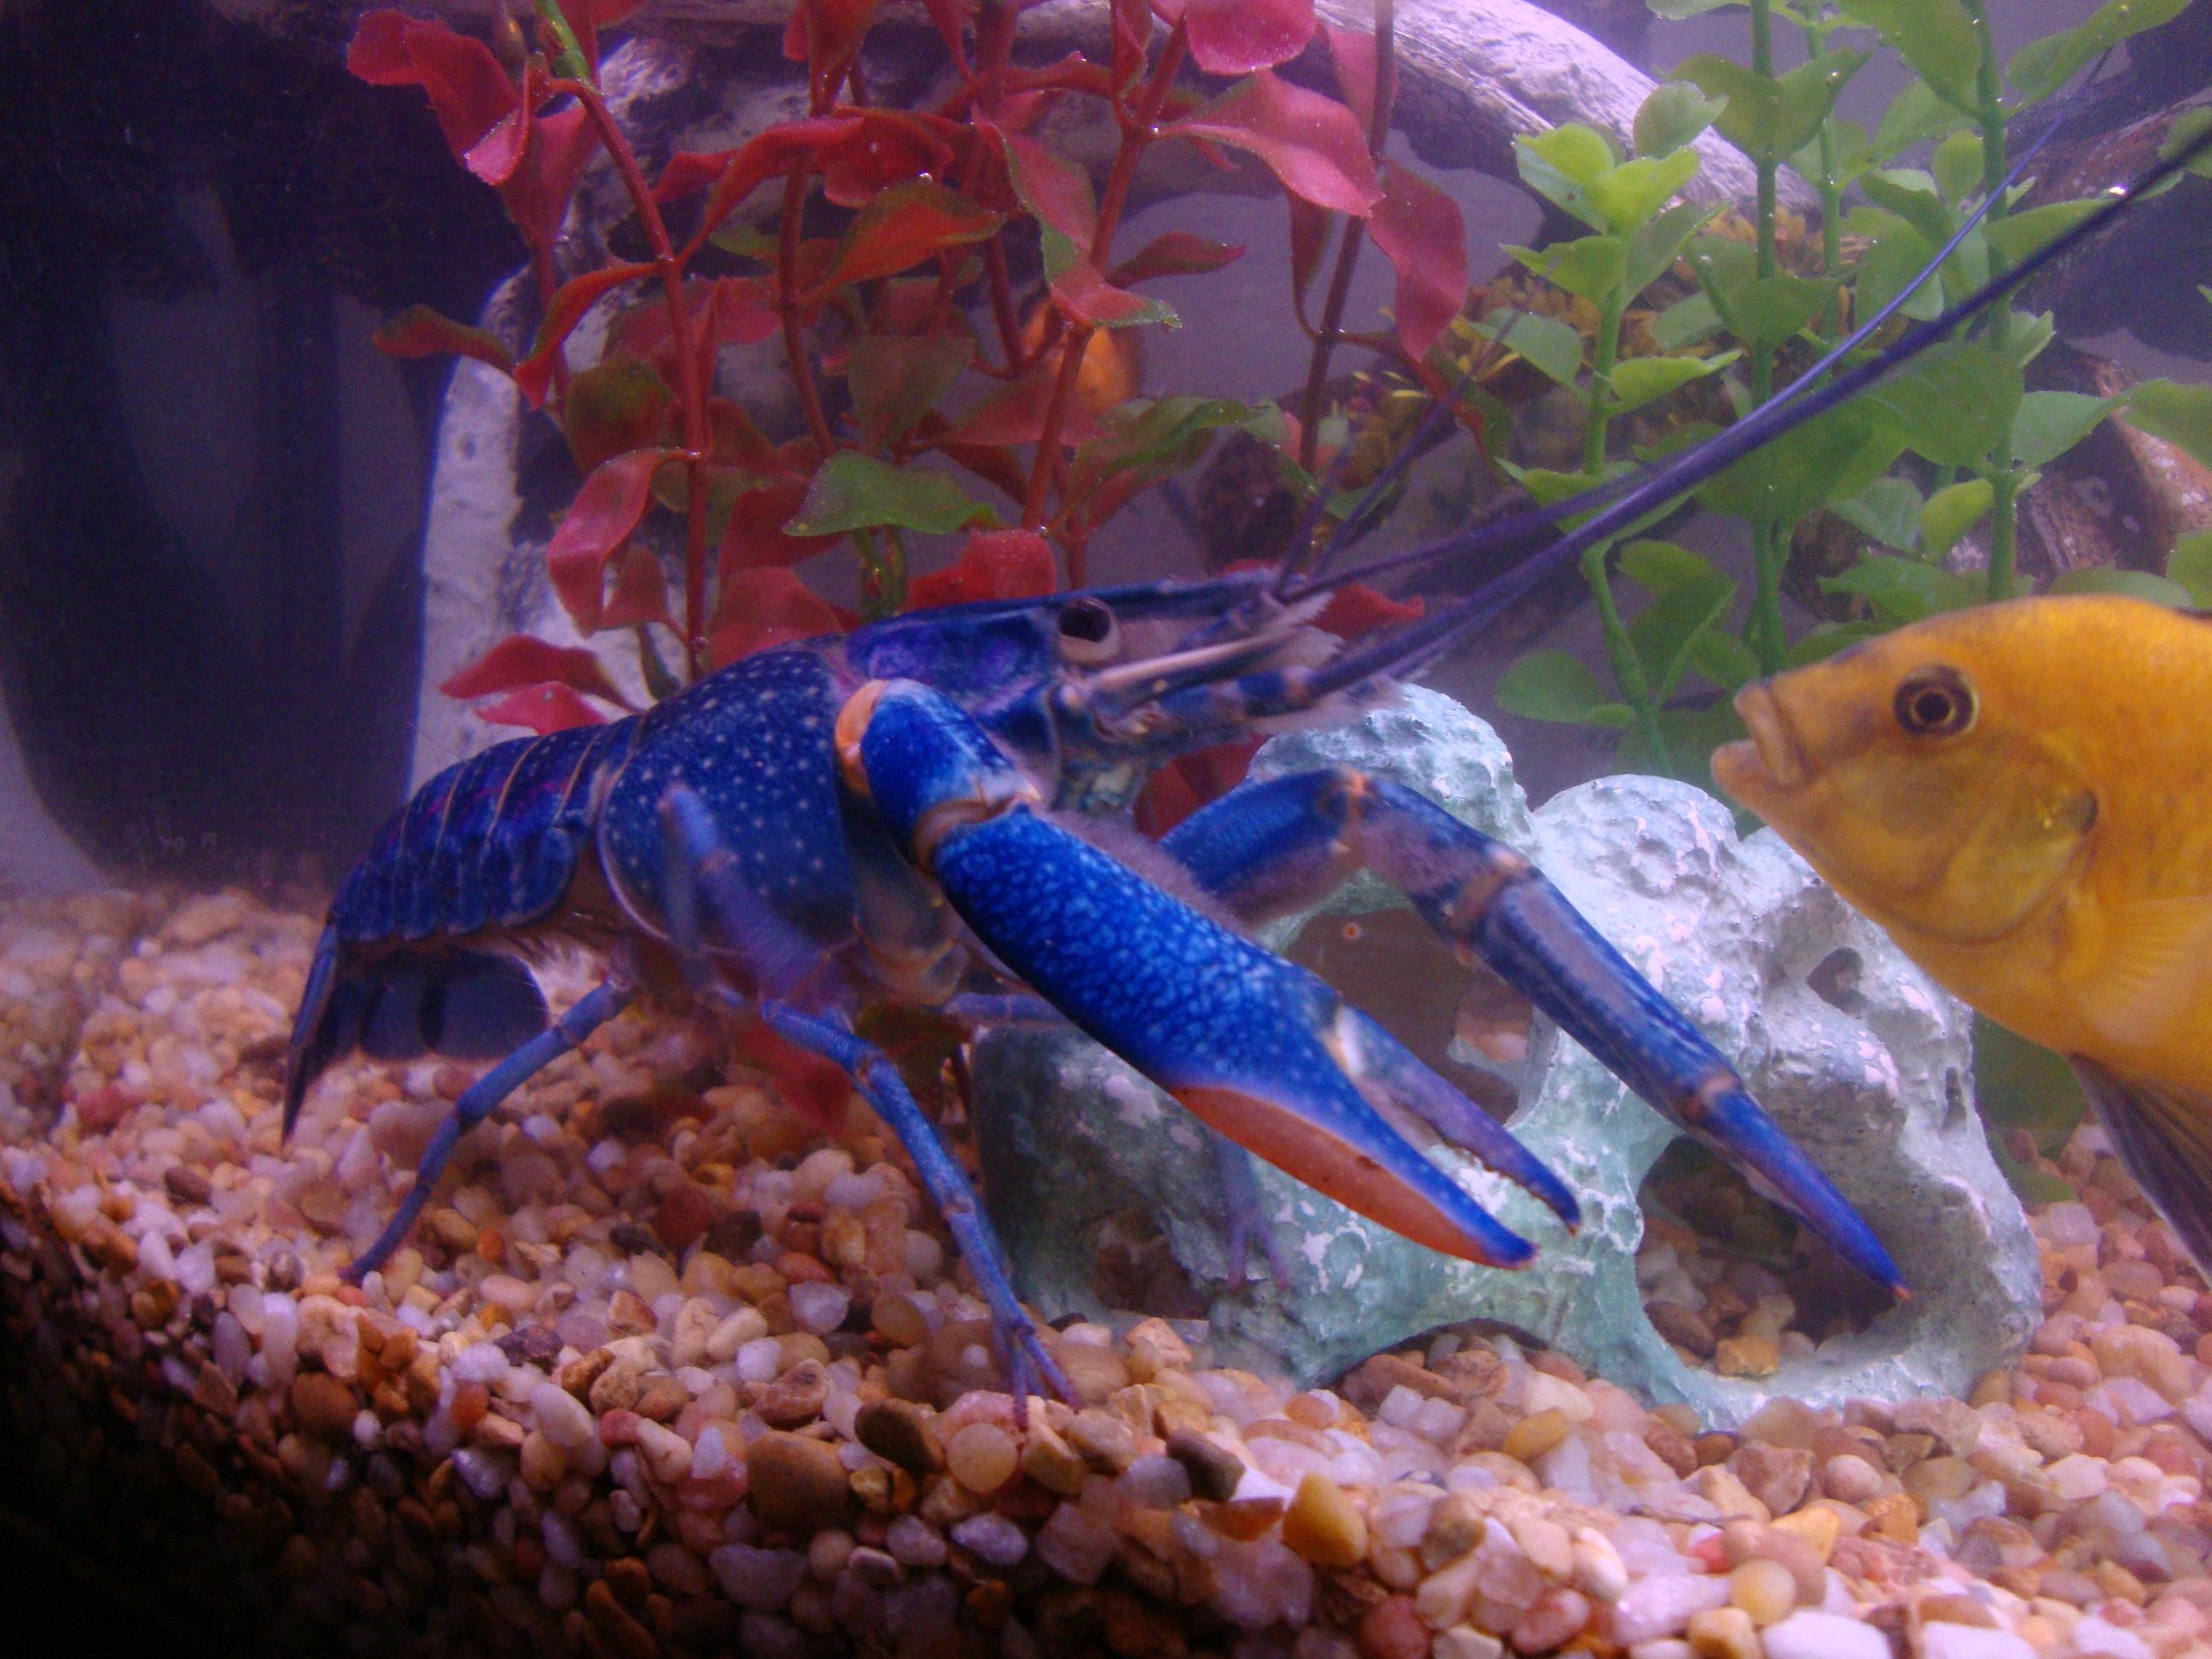 Keeping freshwater aquarium fish - You Can Keep These In A Fresh Water Aquarium I